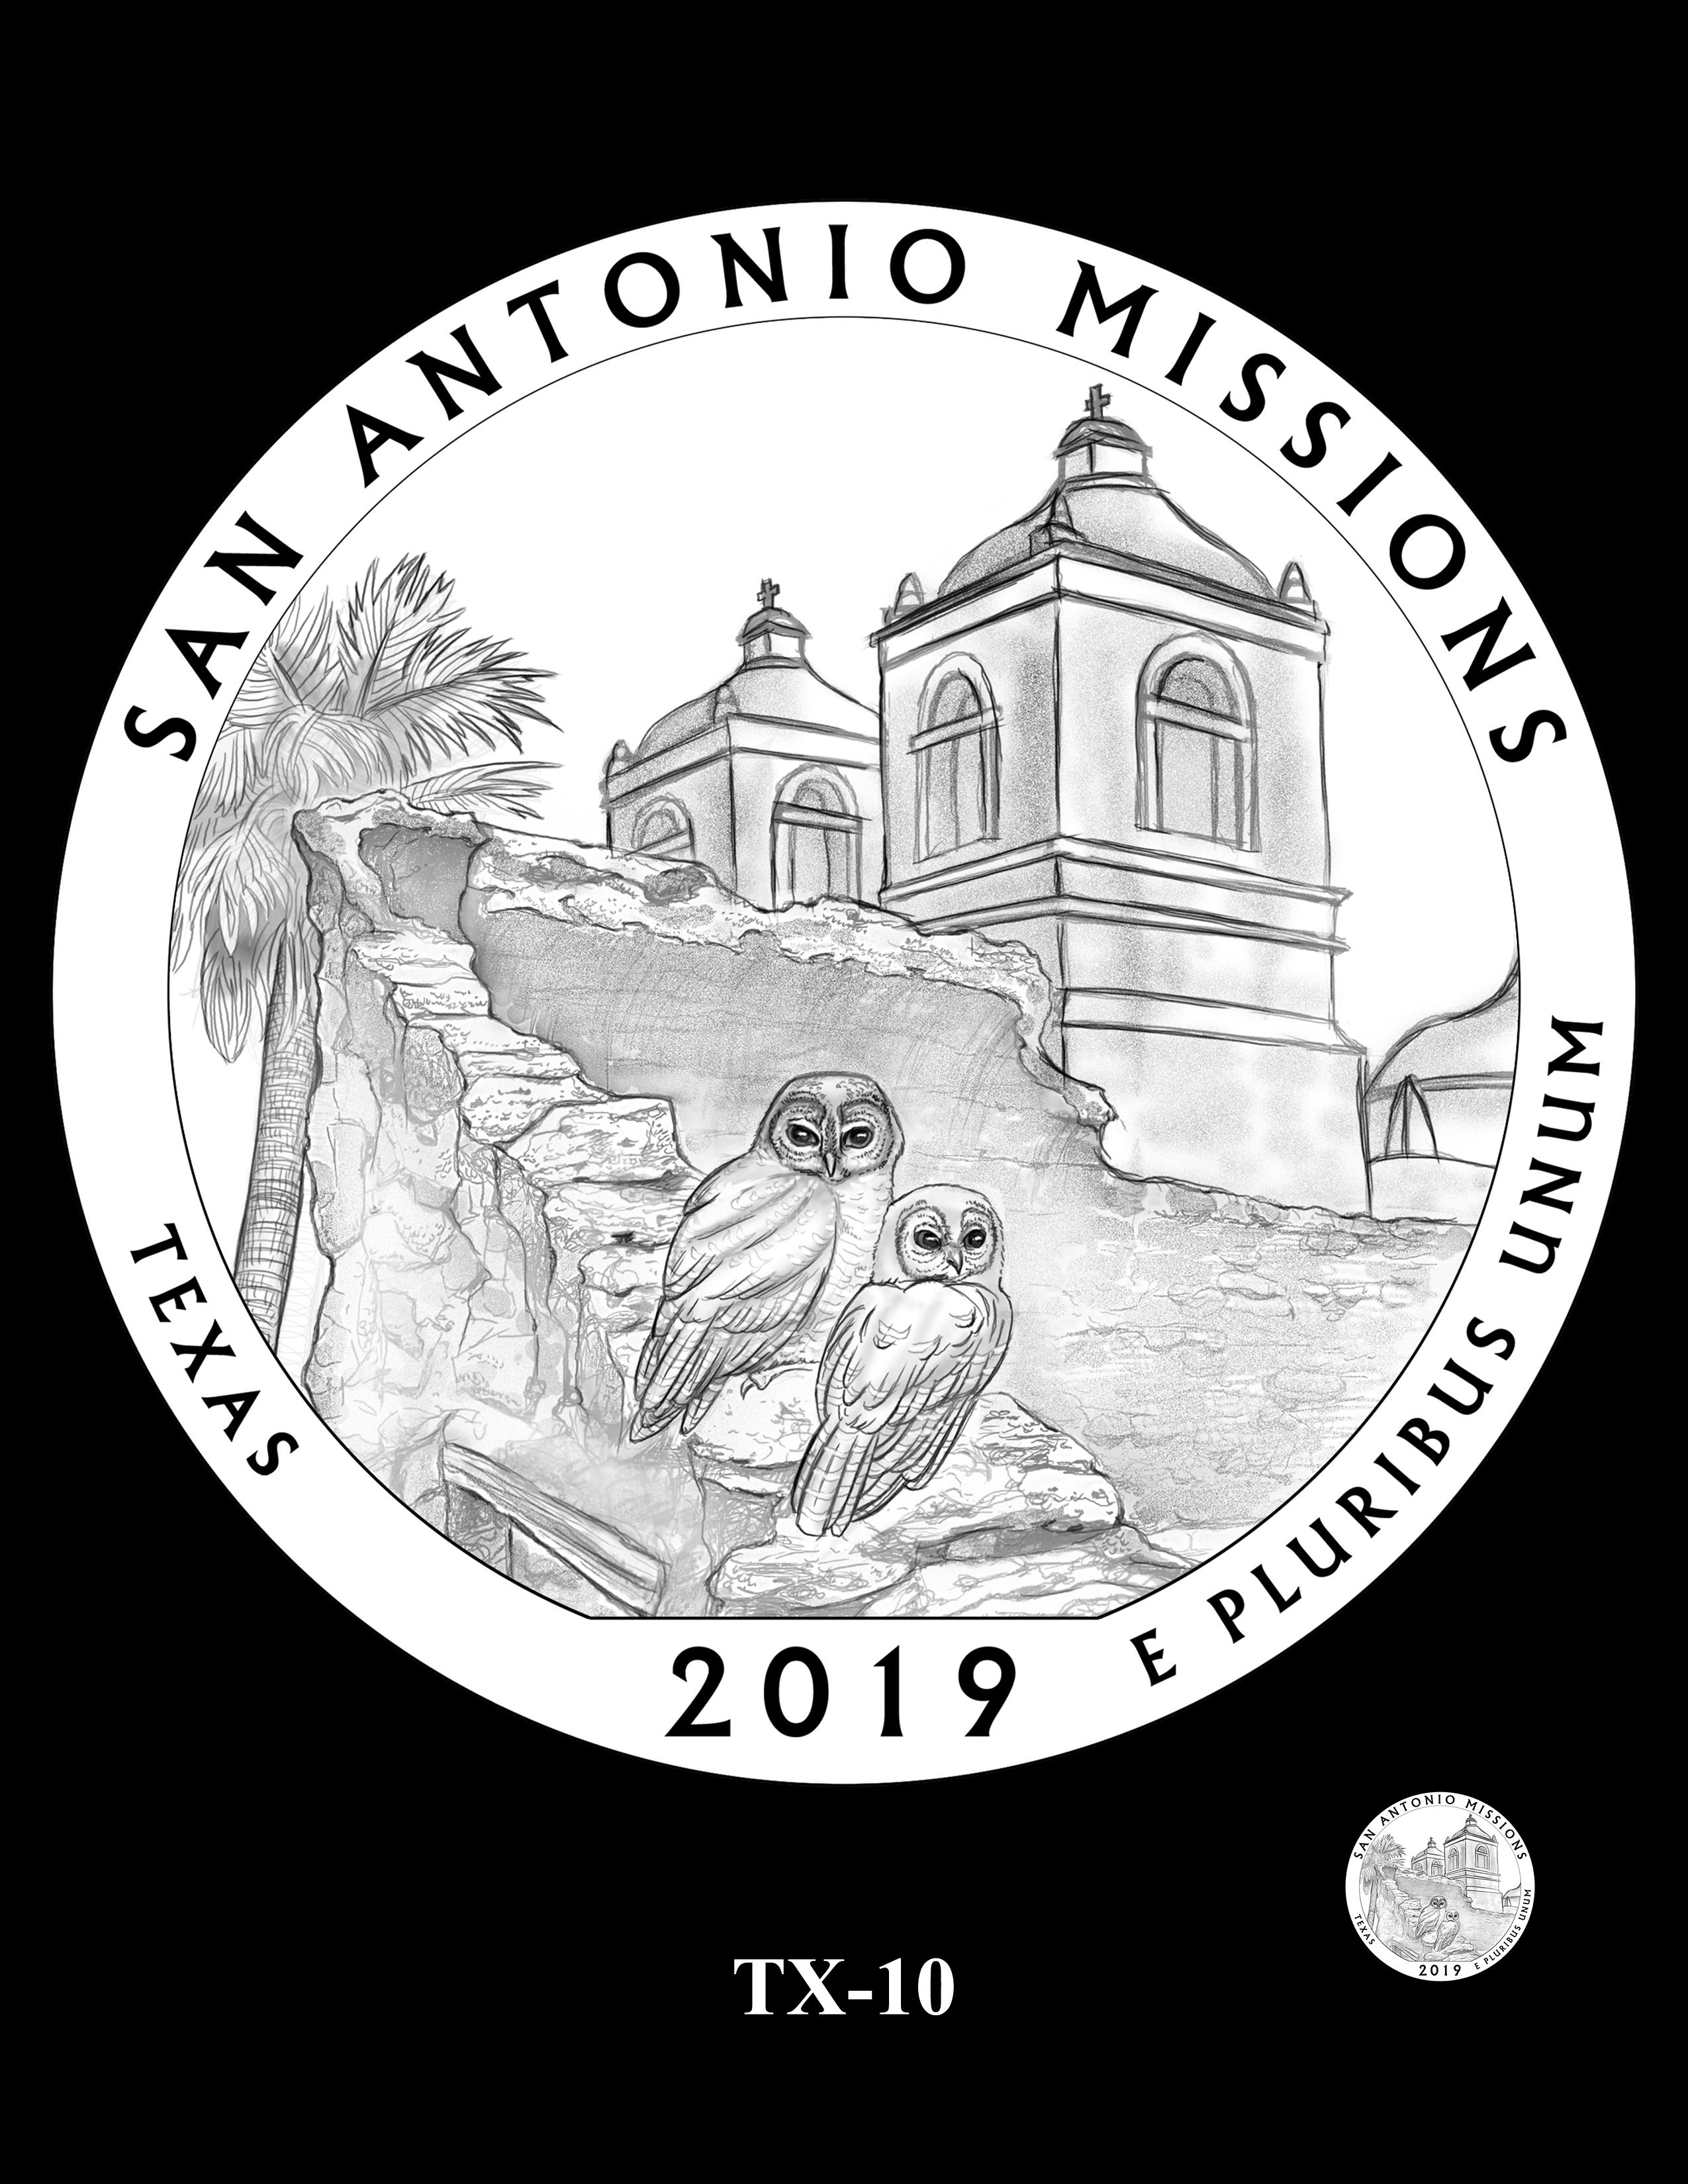 TX-10 -- 2019 America the Beautiful Quarters® Program